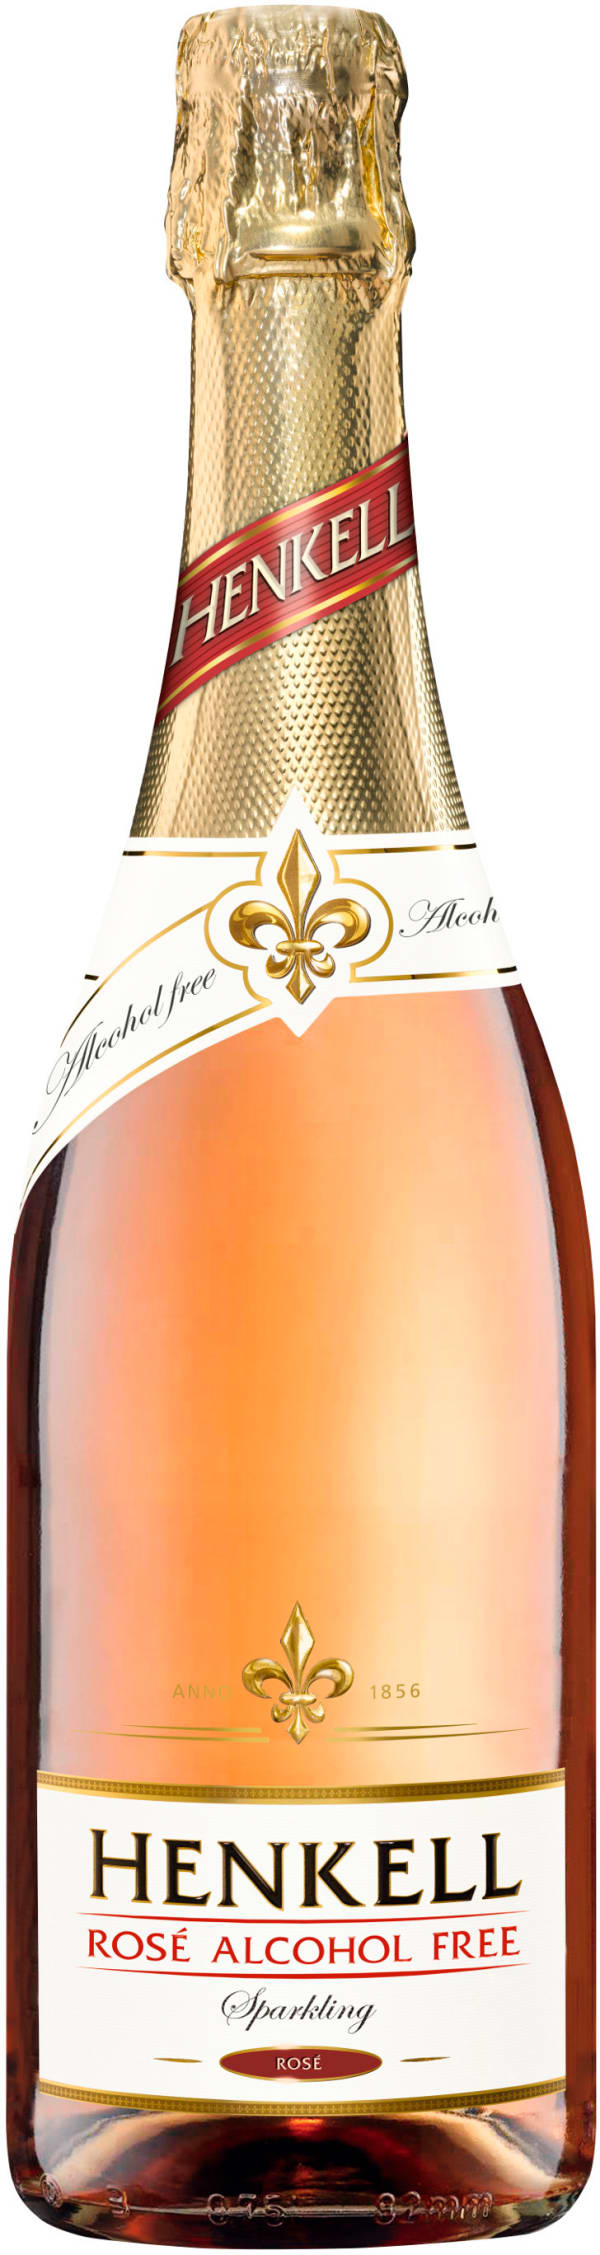 Henkell Sparkling Rosé Alkoholfrei